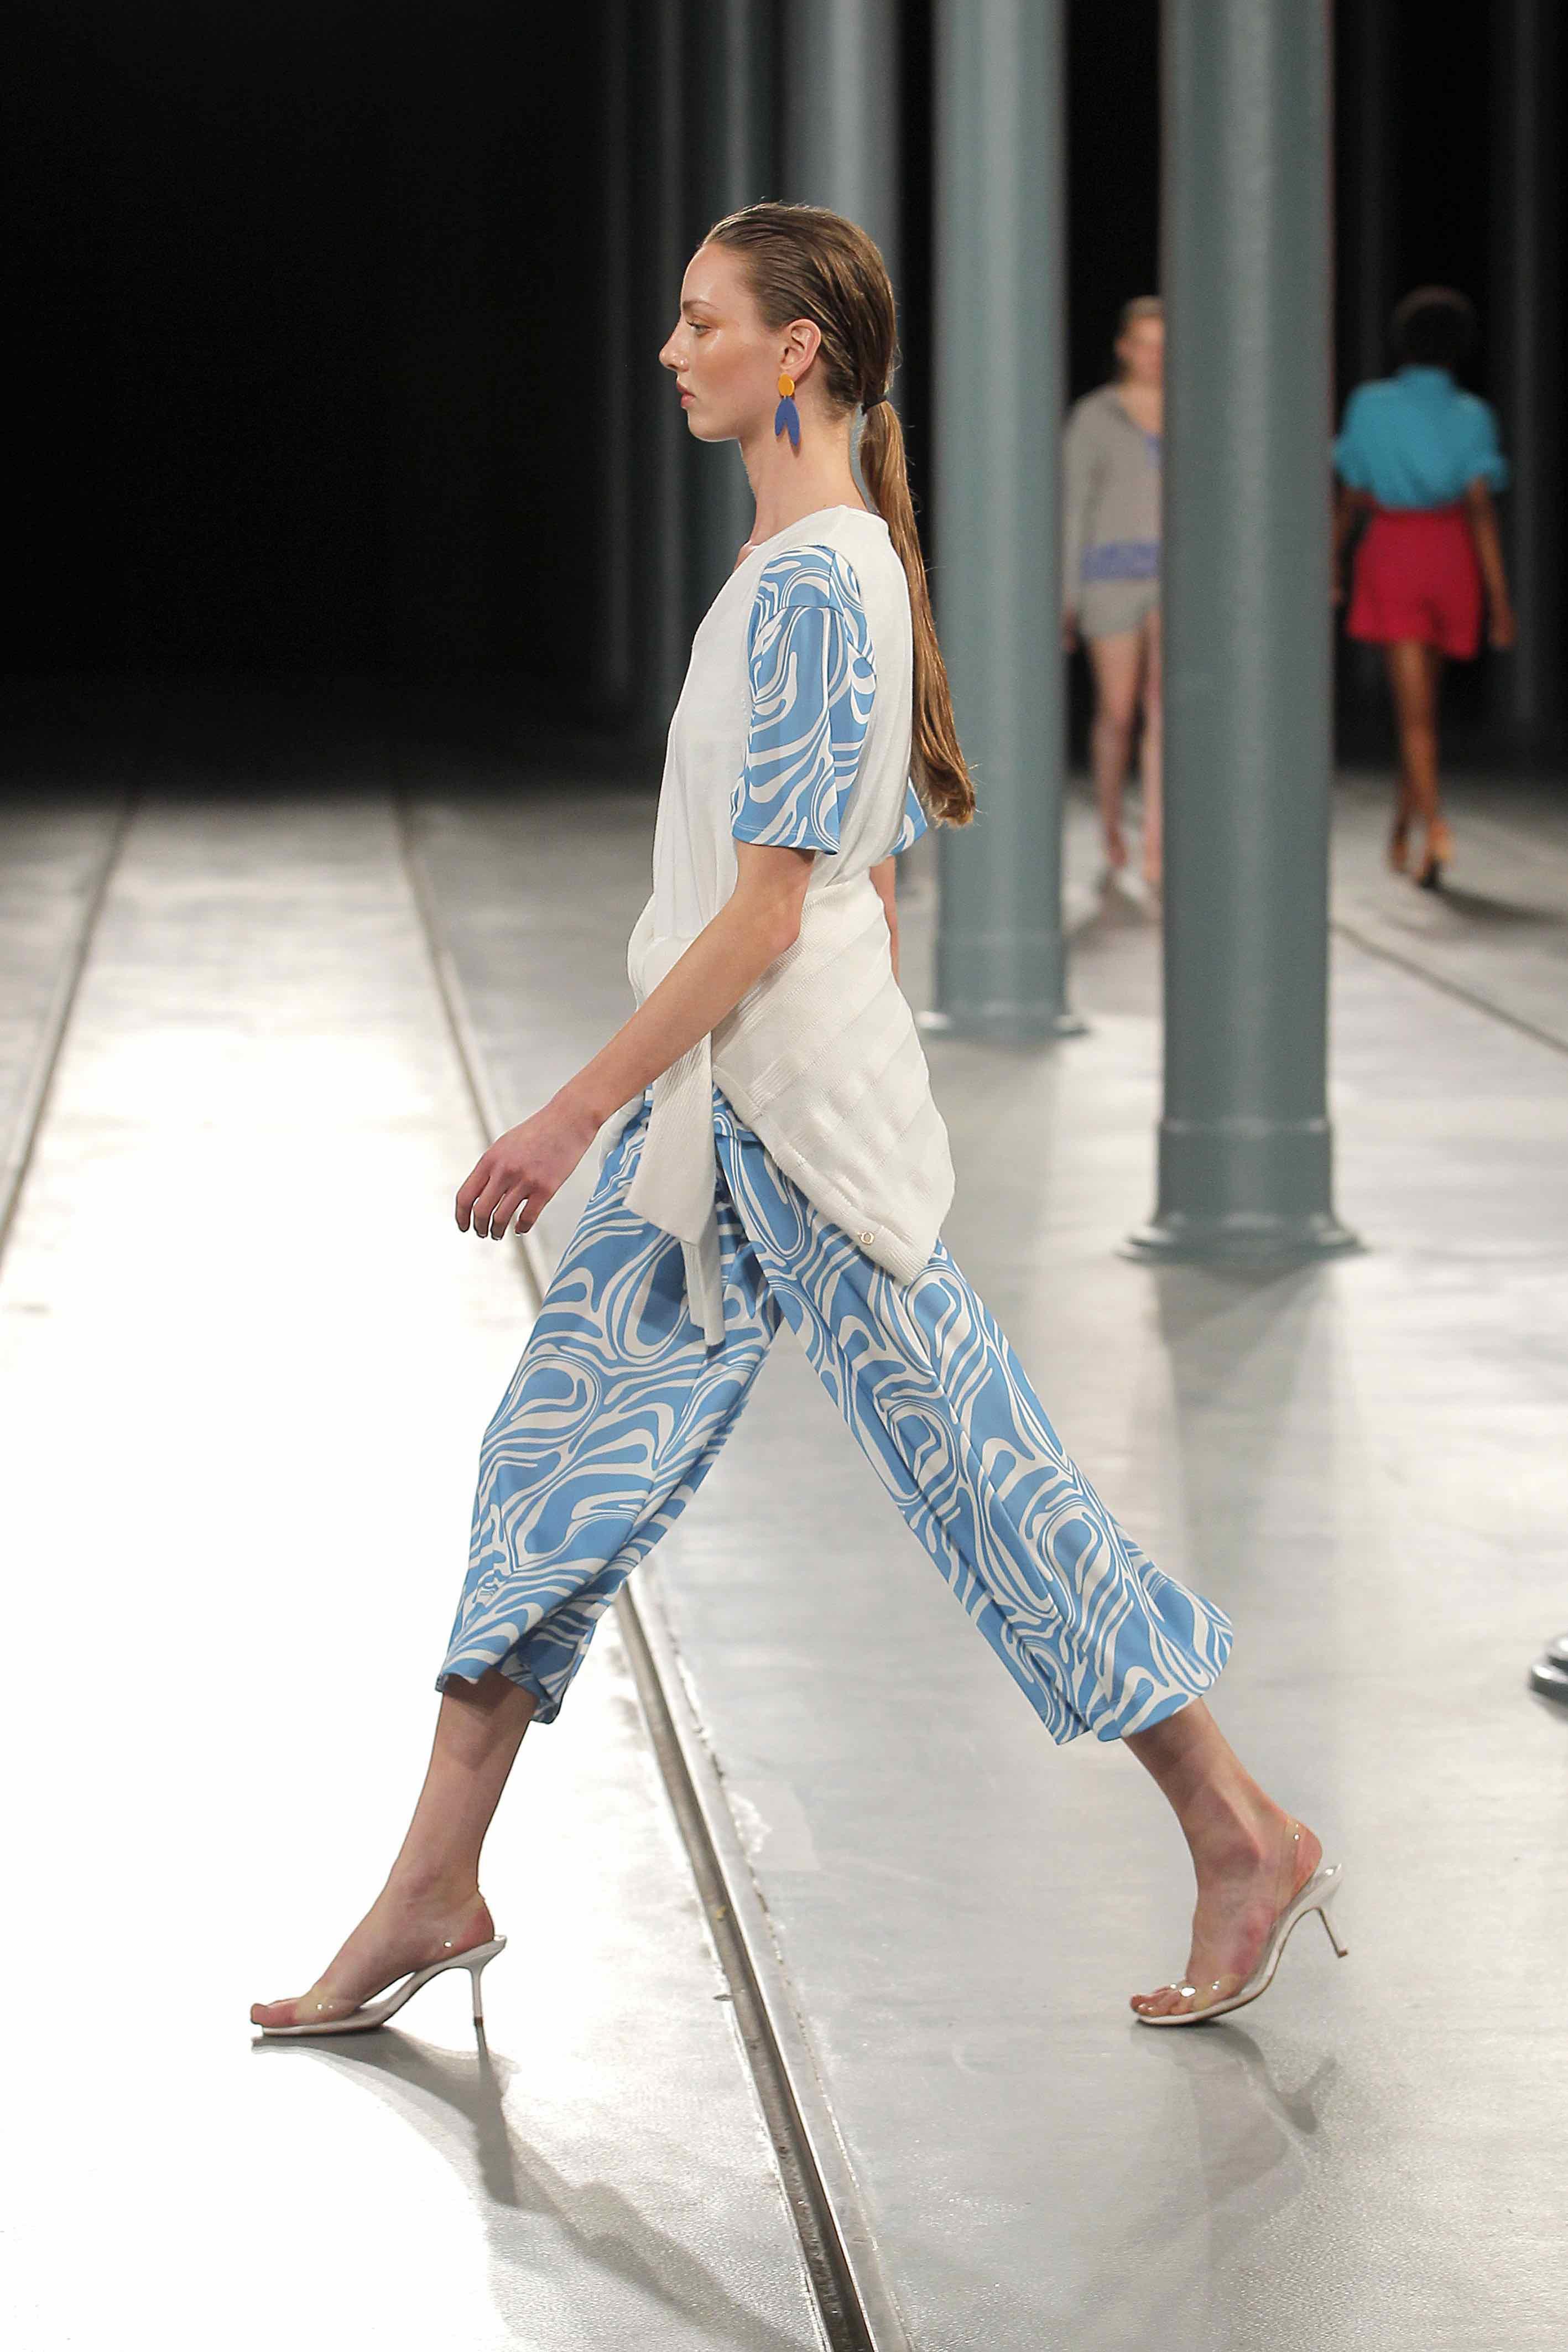 Portugal Fashion #SofaEdition 14